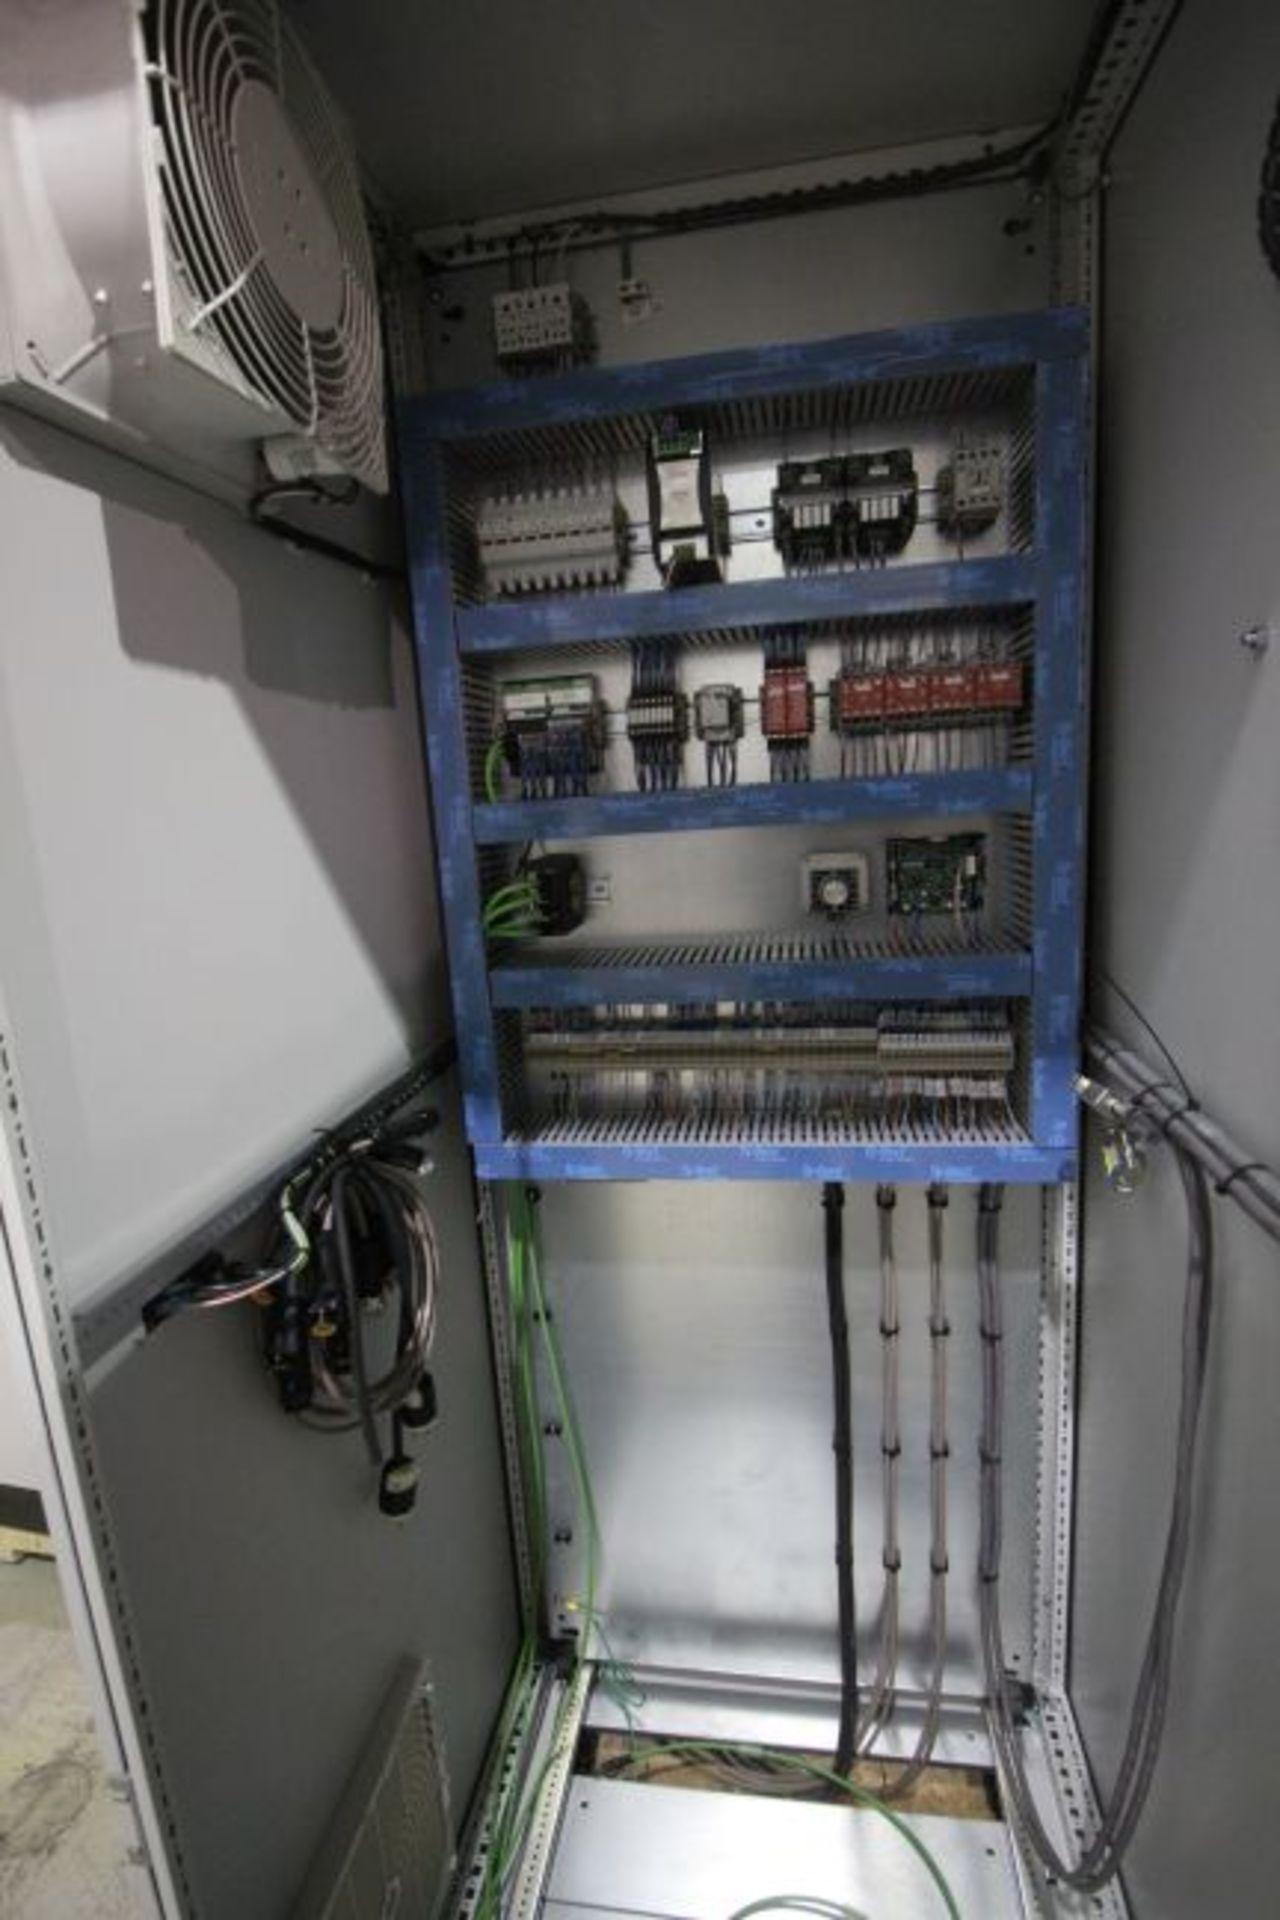 ABB DUAL ROBOT PLC CONTROLLER, MODEL 5108-910 - Image 3 of 6